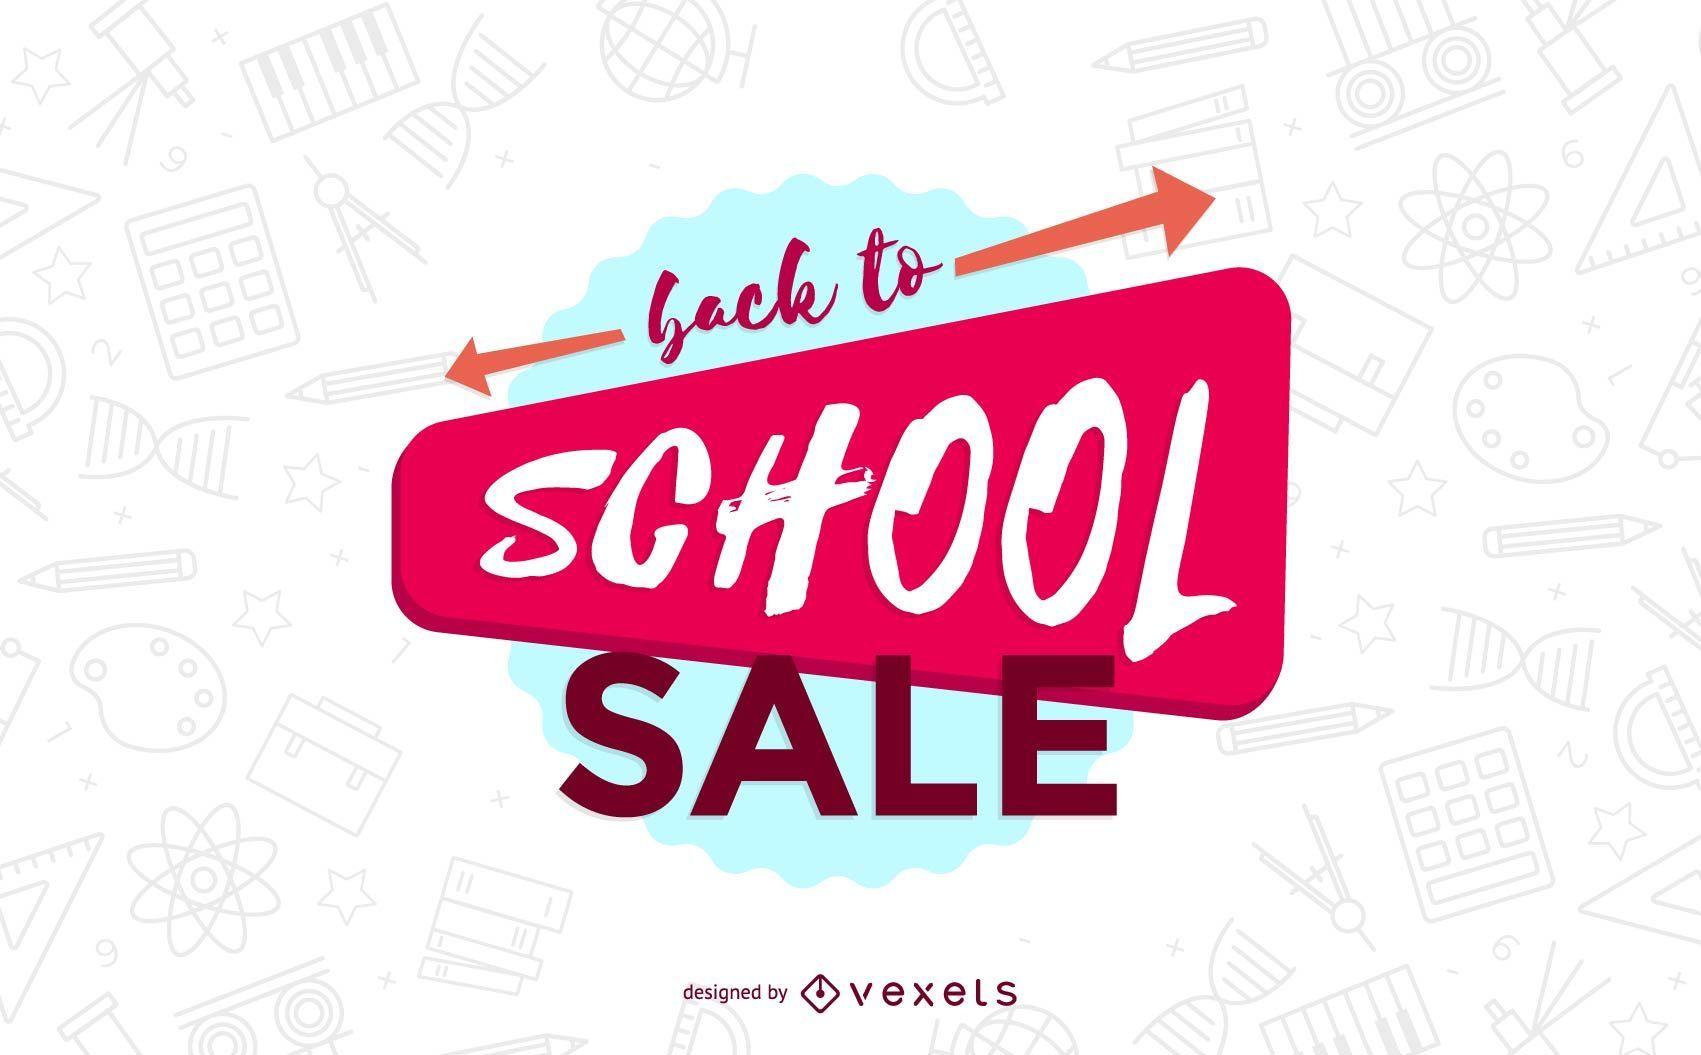 Back to school sale flyer